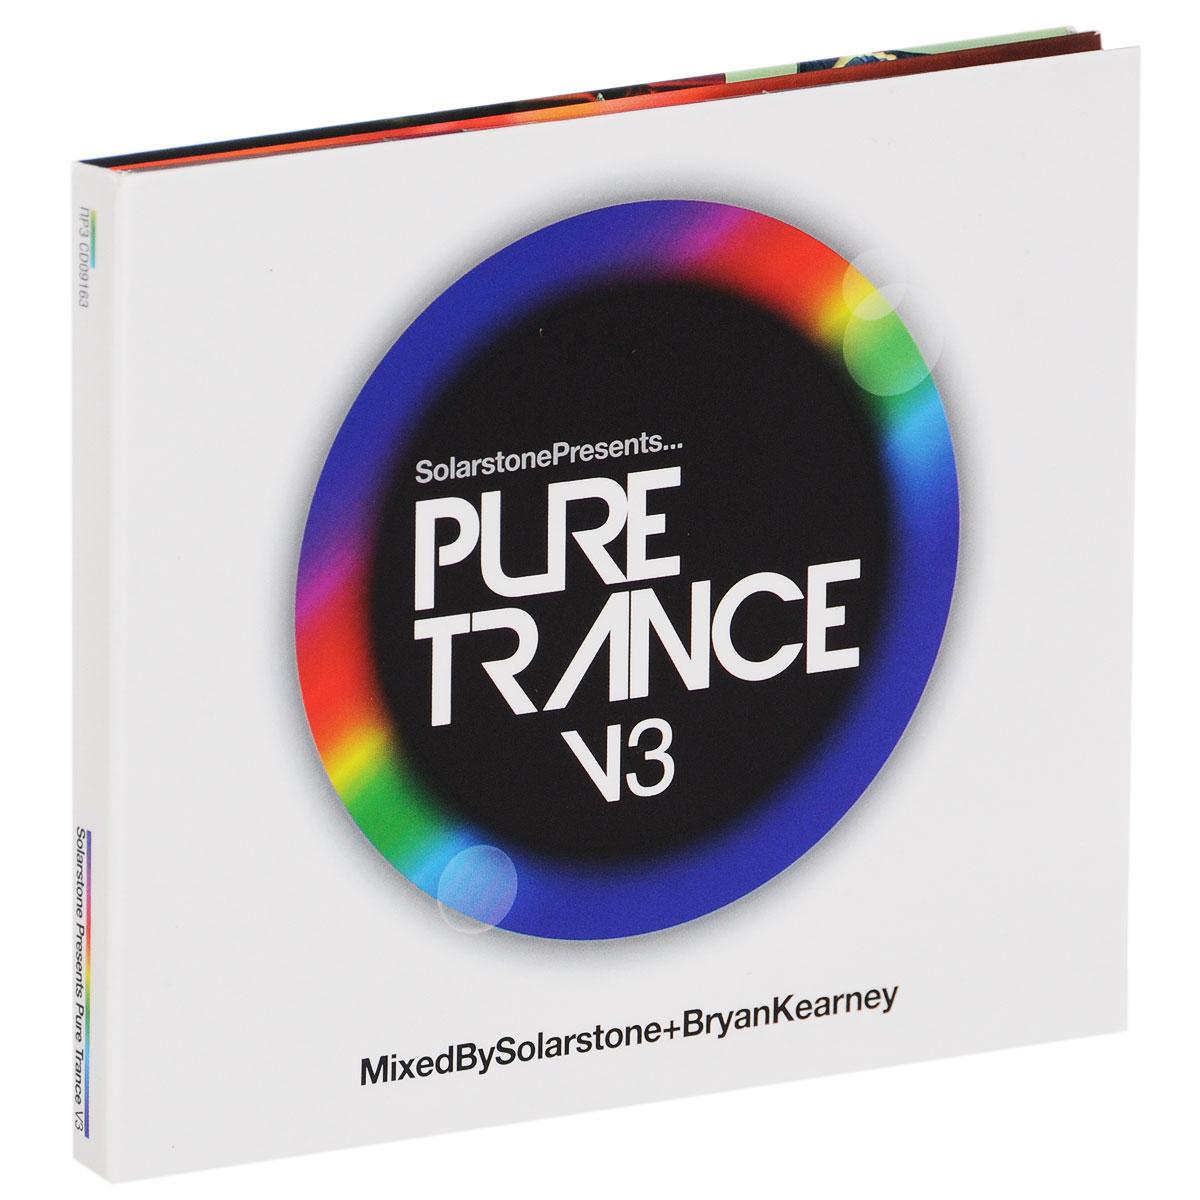 Solarstone & Bryan Kearney. Pure Trance. Volume 3 (2 CD) 2015 2 Audio CD